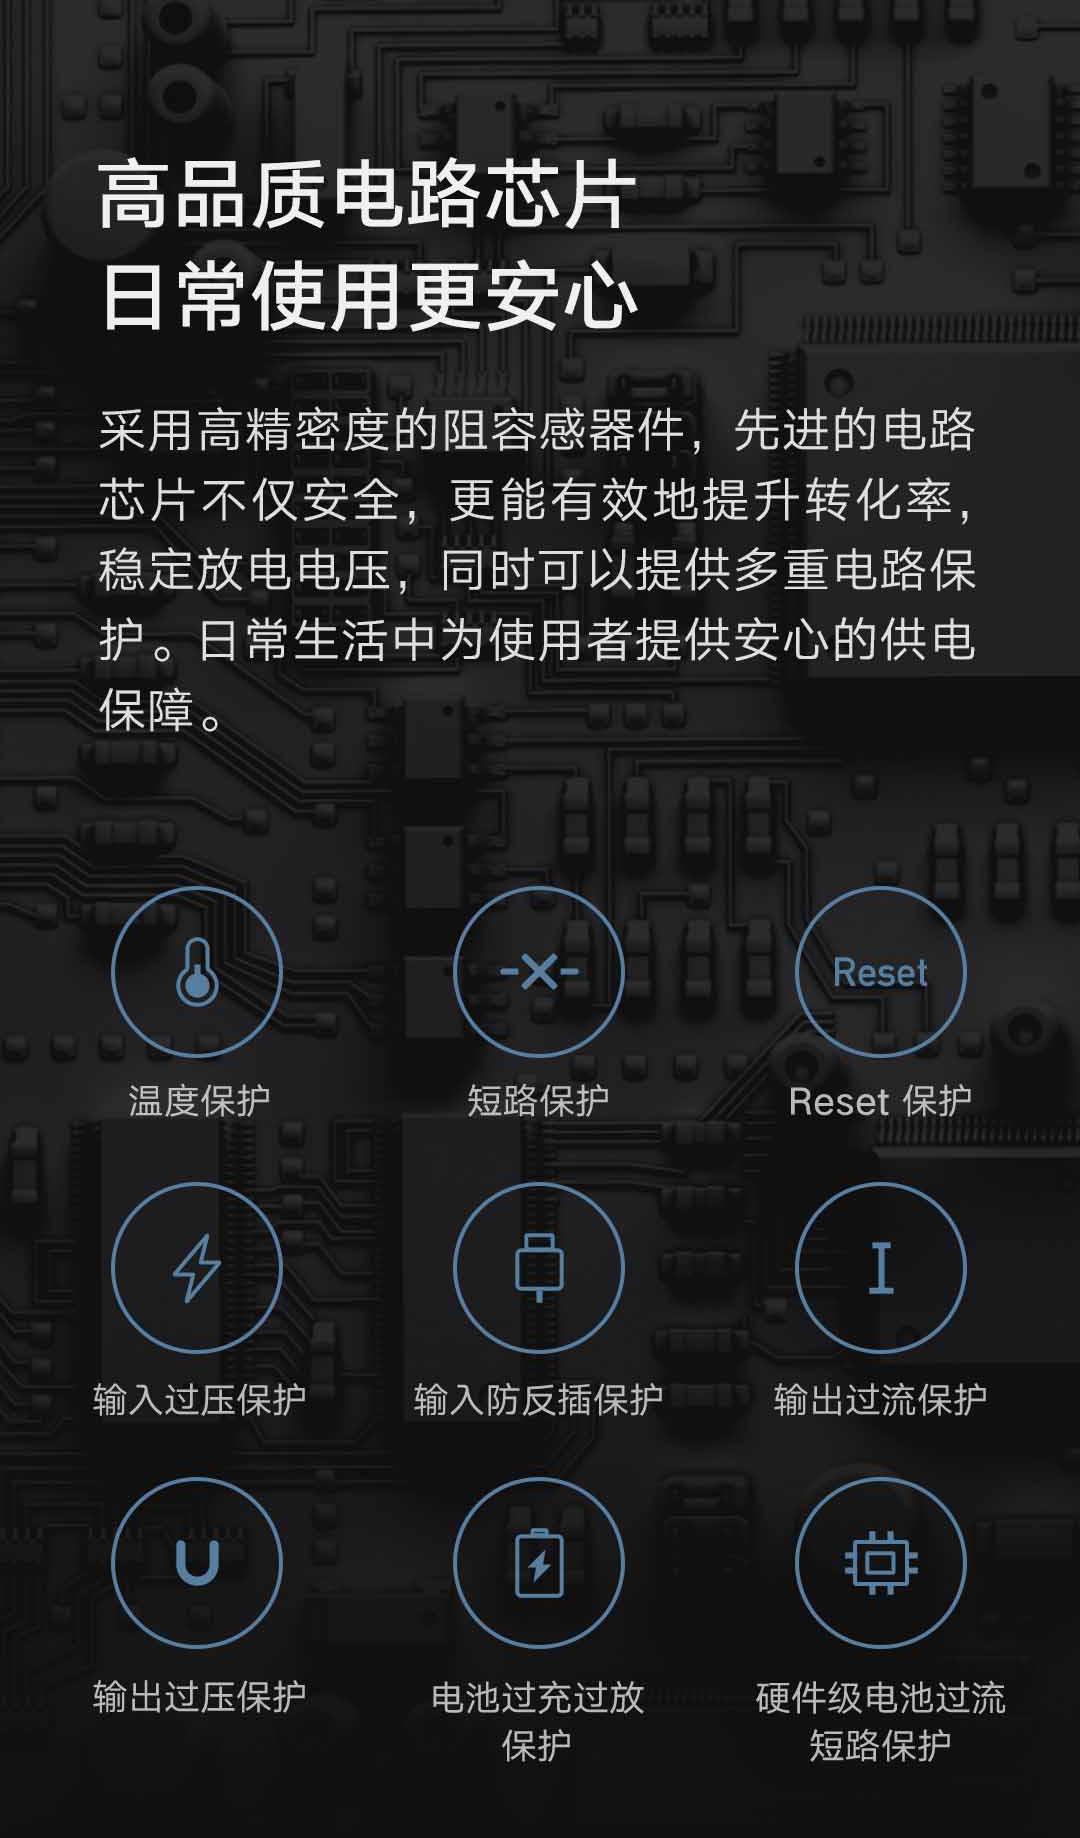 1600x_image.png?1592654392